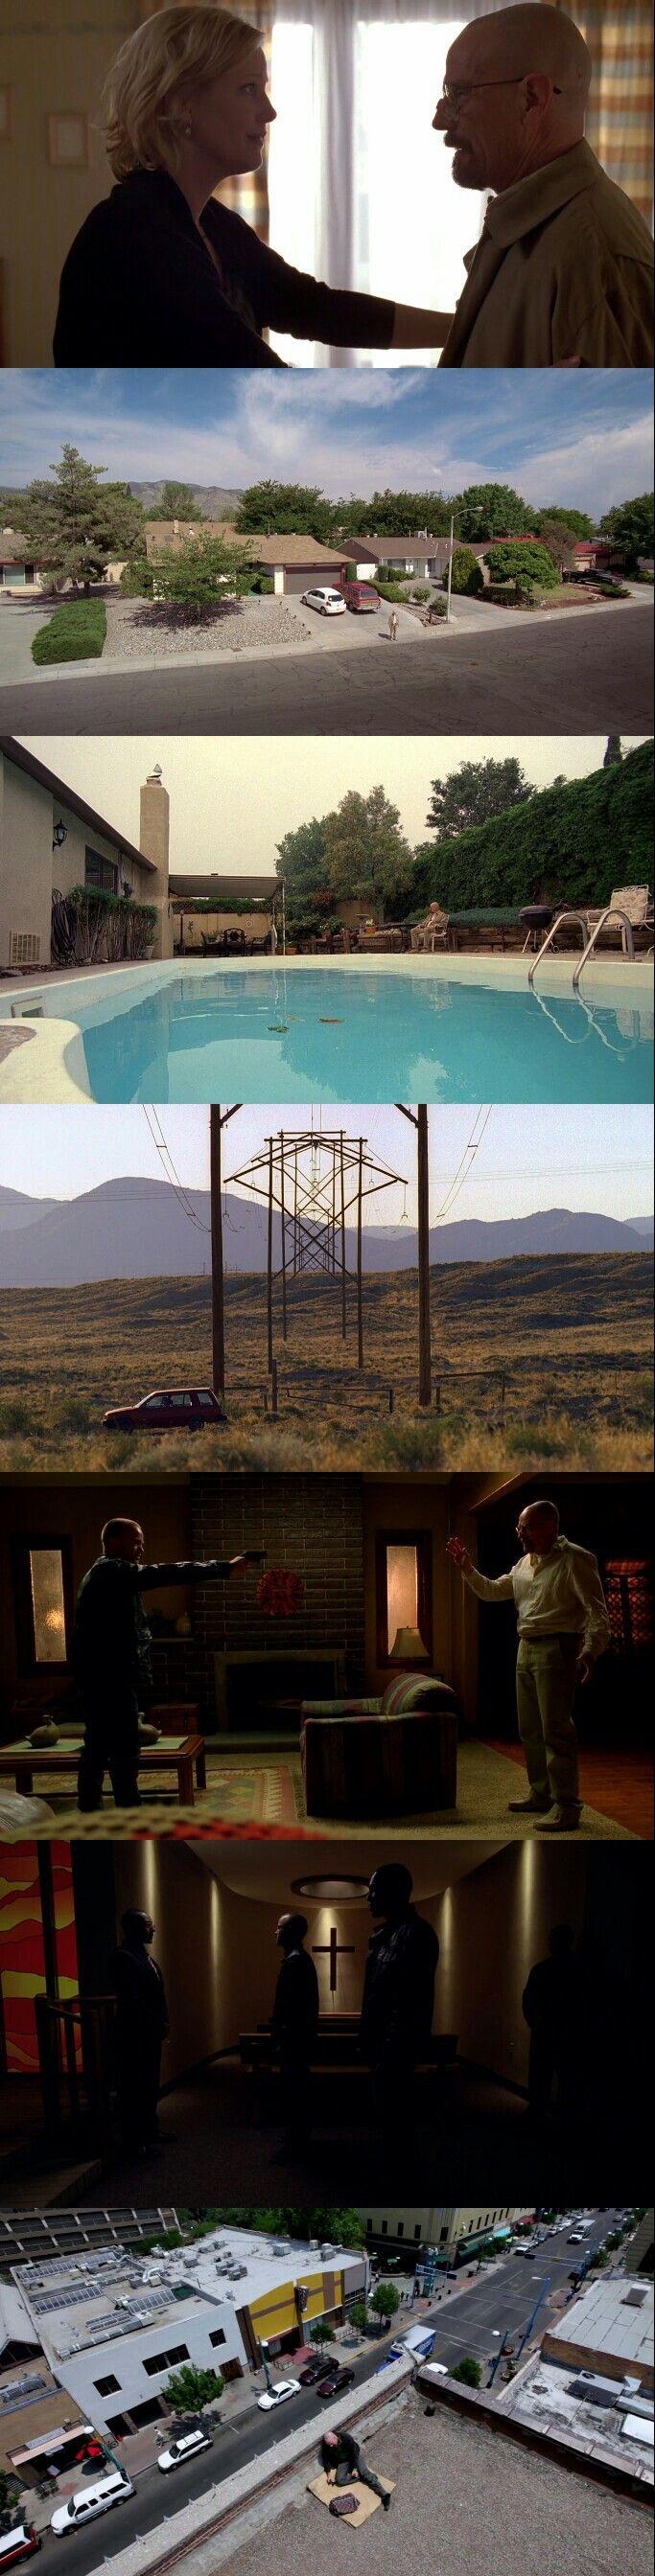 Breaking Bad (2008 - 2013) Season 4 Episode 11: End Times.